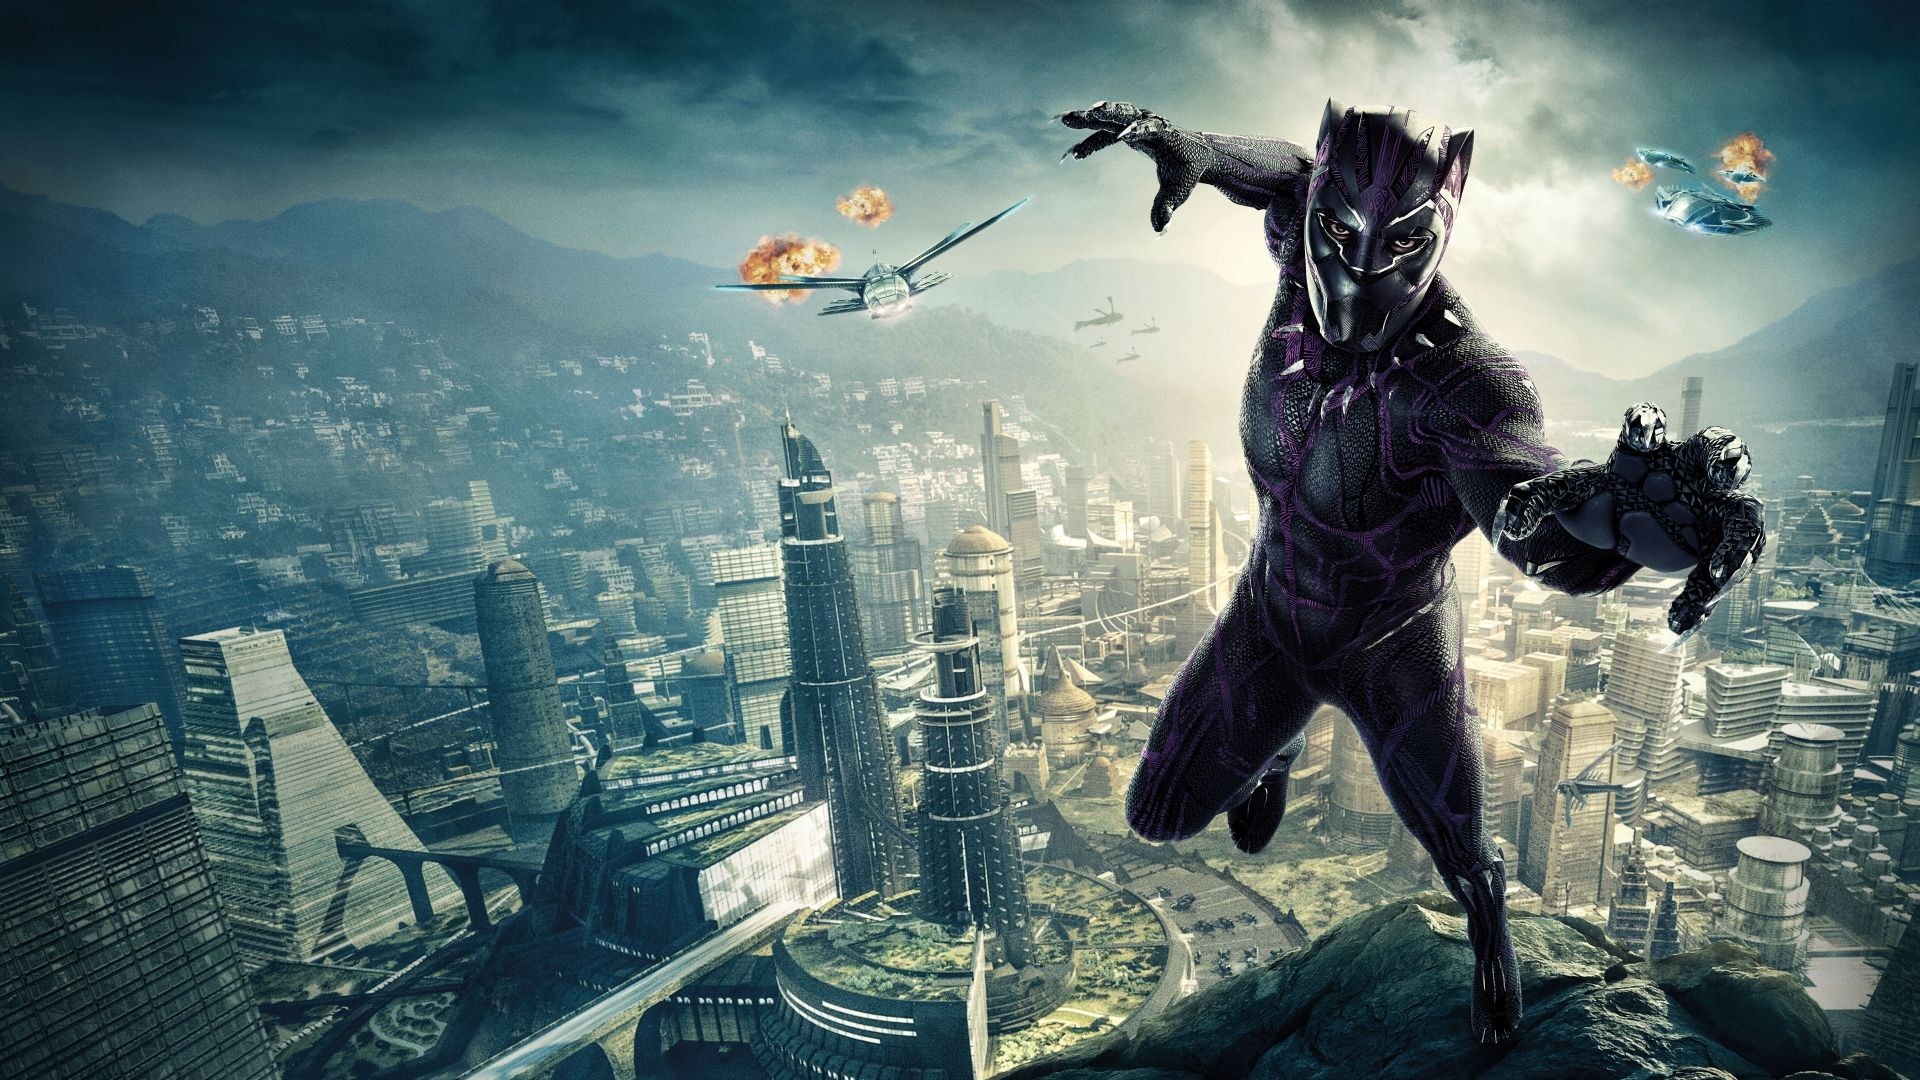 Wakanda Black Panther Wallpapers Top Free Wakanda Black Panther